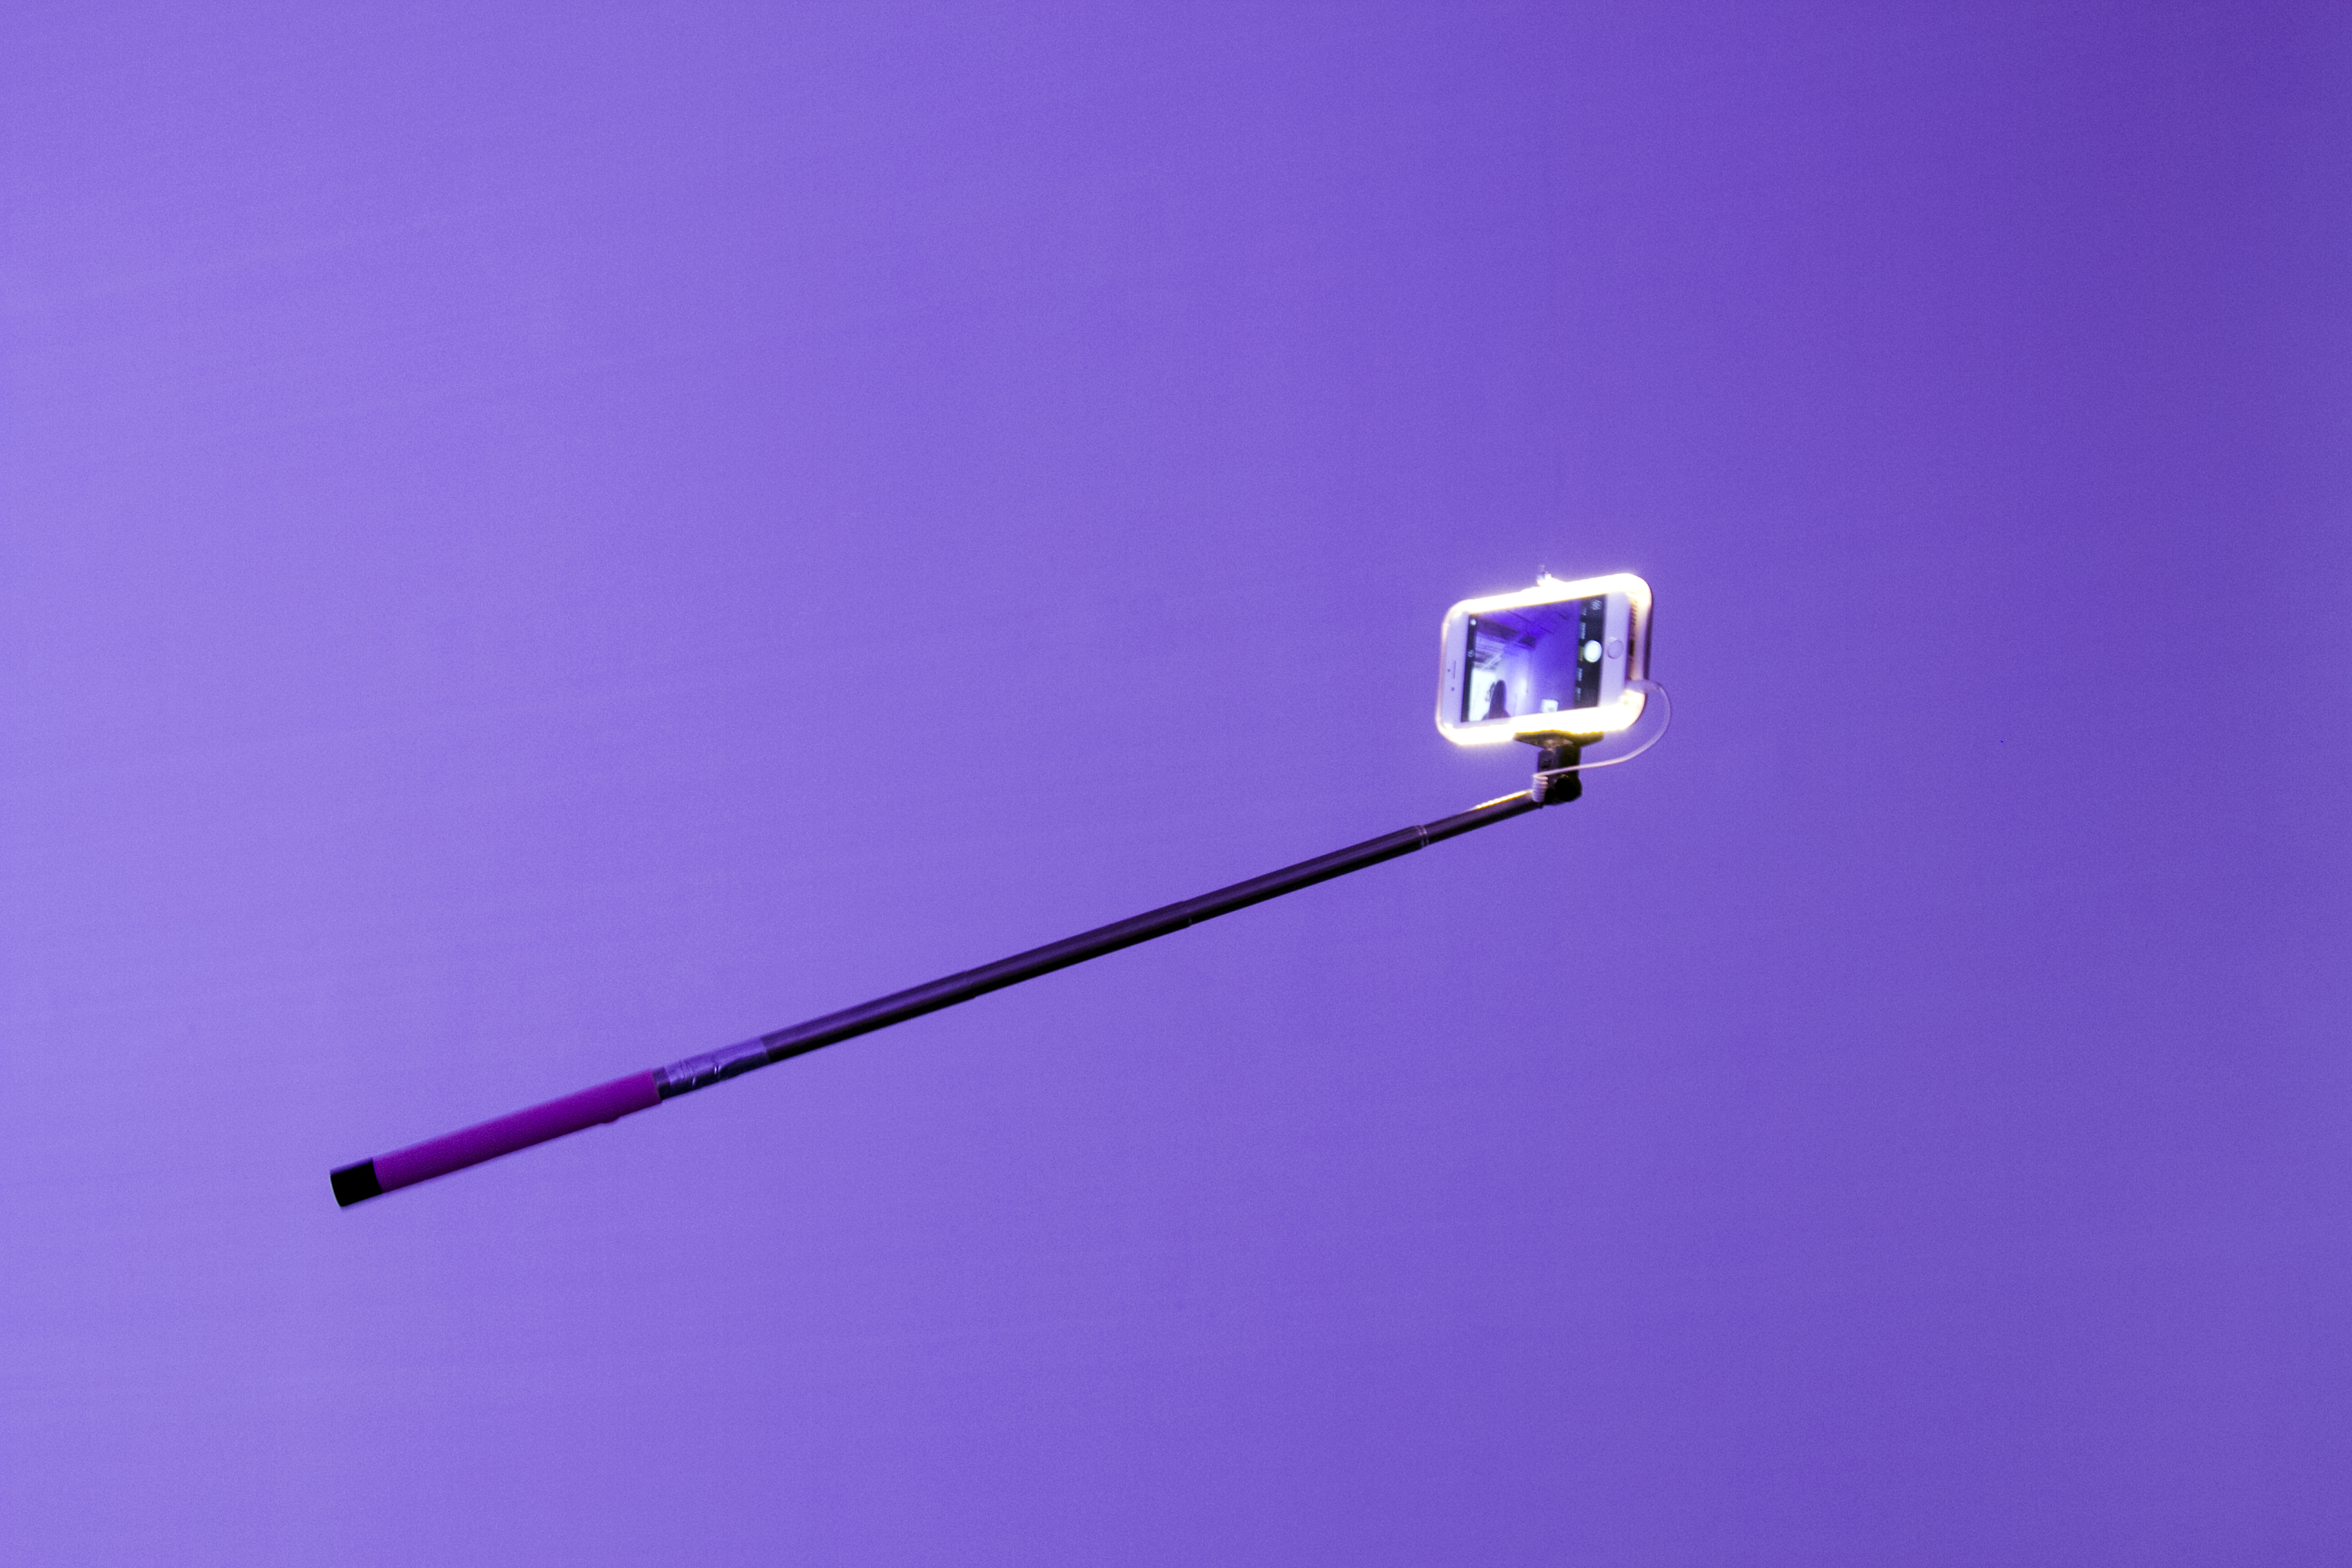 Showroom Floating Selfie Stick